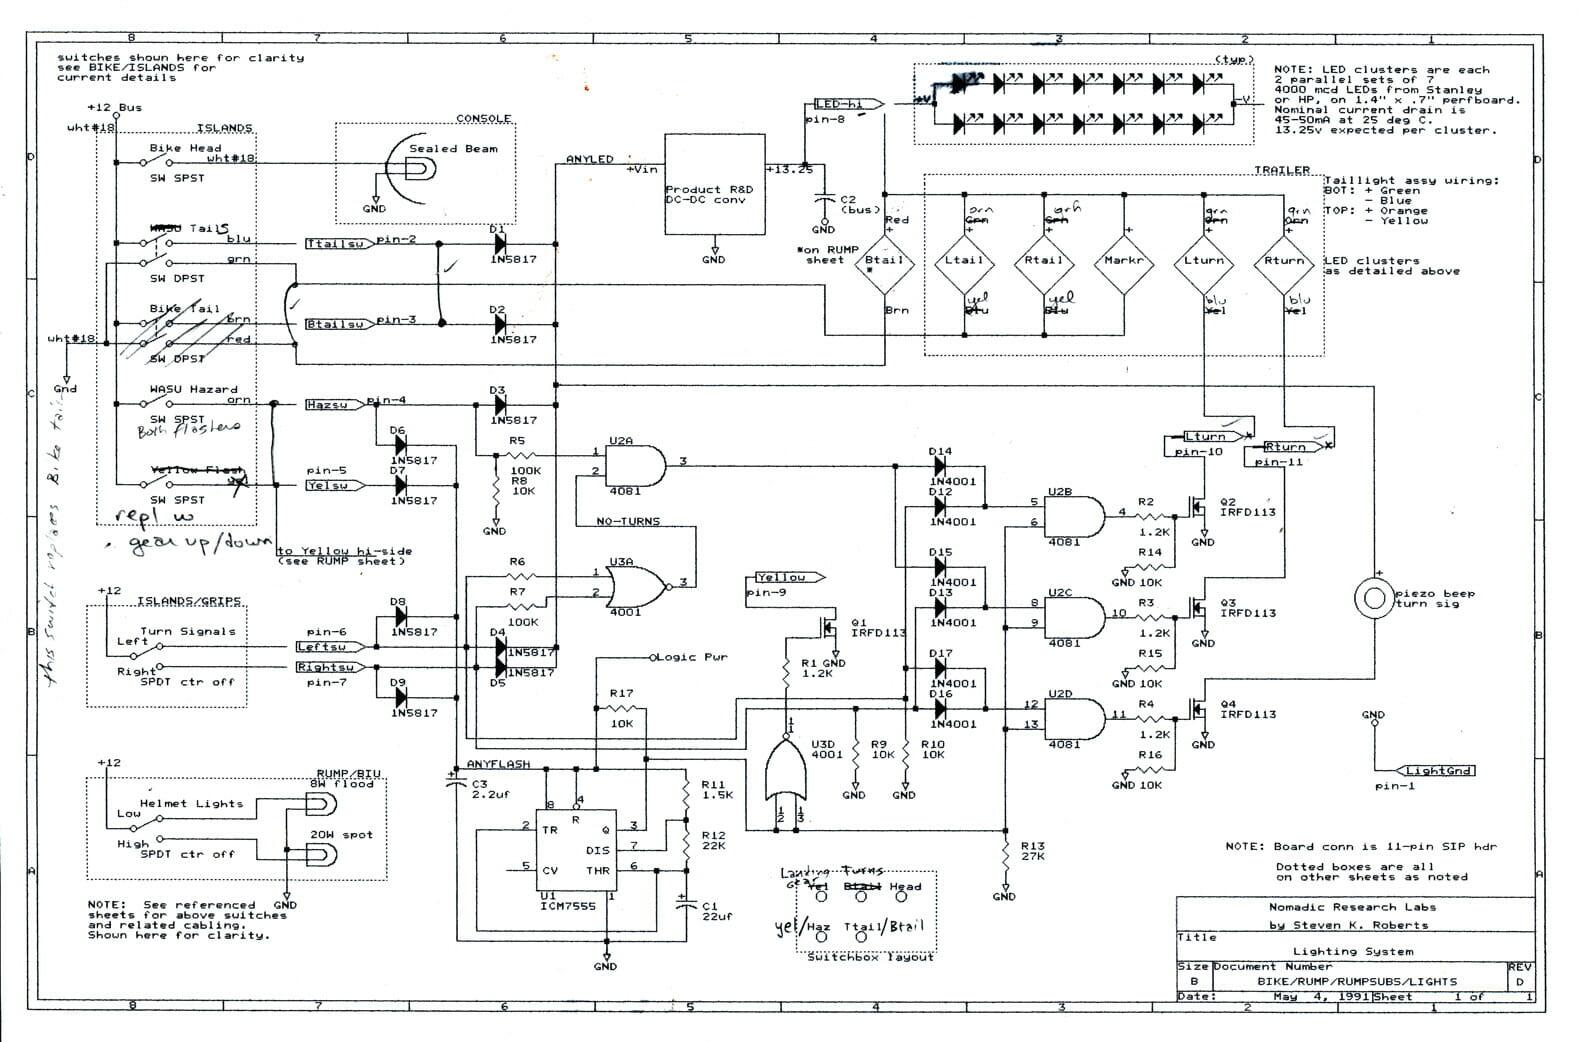 BEHEMOTH lighting schematic - Nomadic Research Labs on alesis ra150 schematic, alesis sr-16 demo, alesis studio 32 schematic,